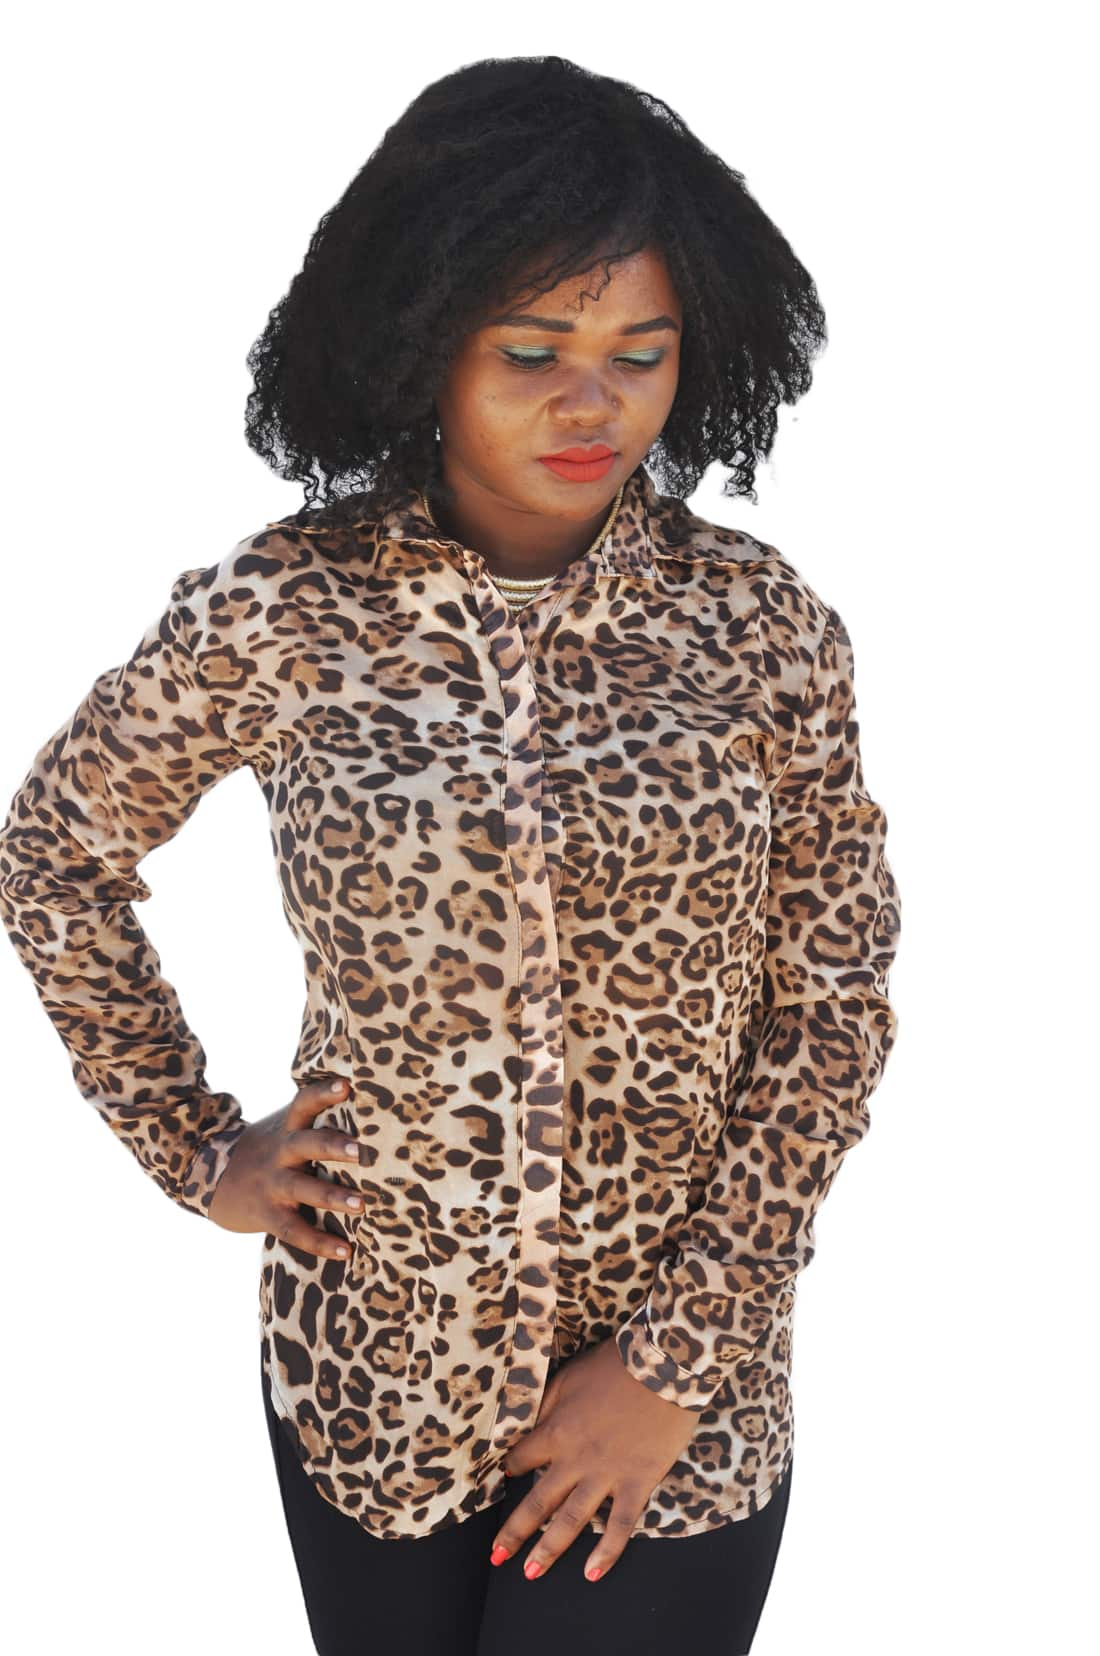 M0199 animalprint2 Blouses Tops Shirts maureens.com boutique